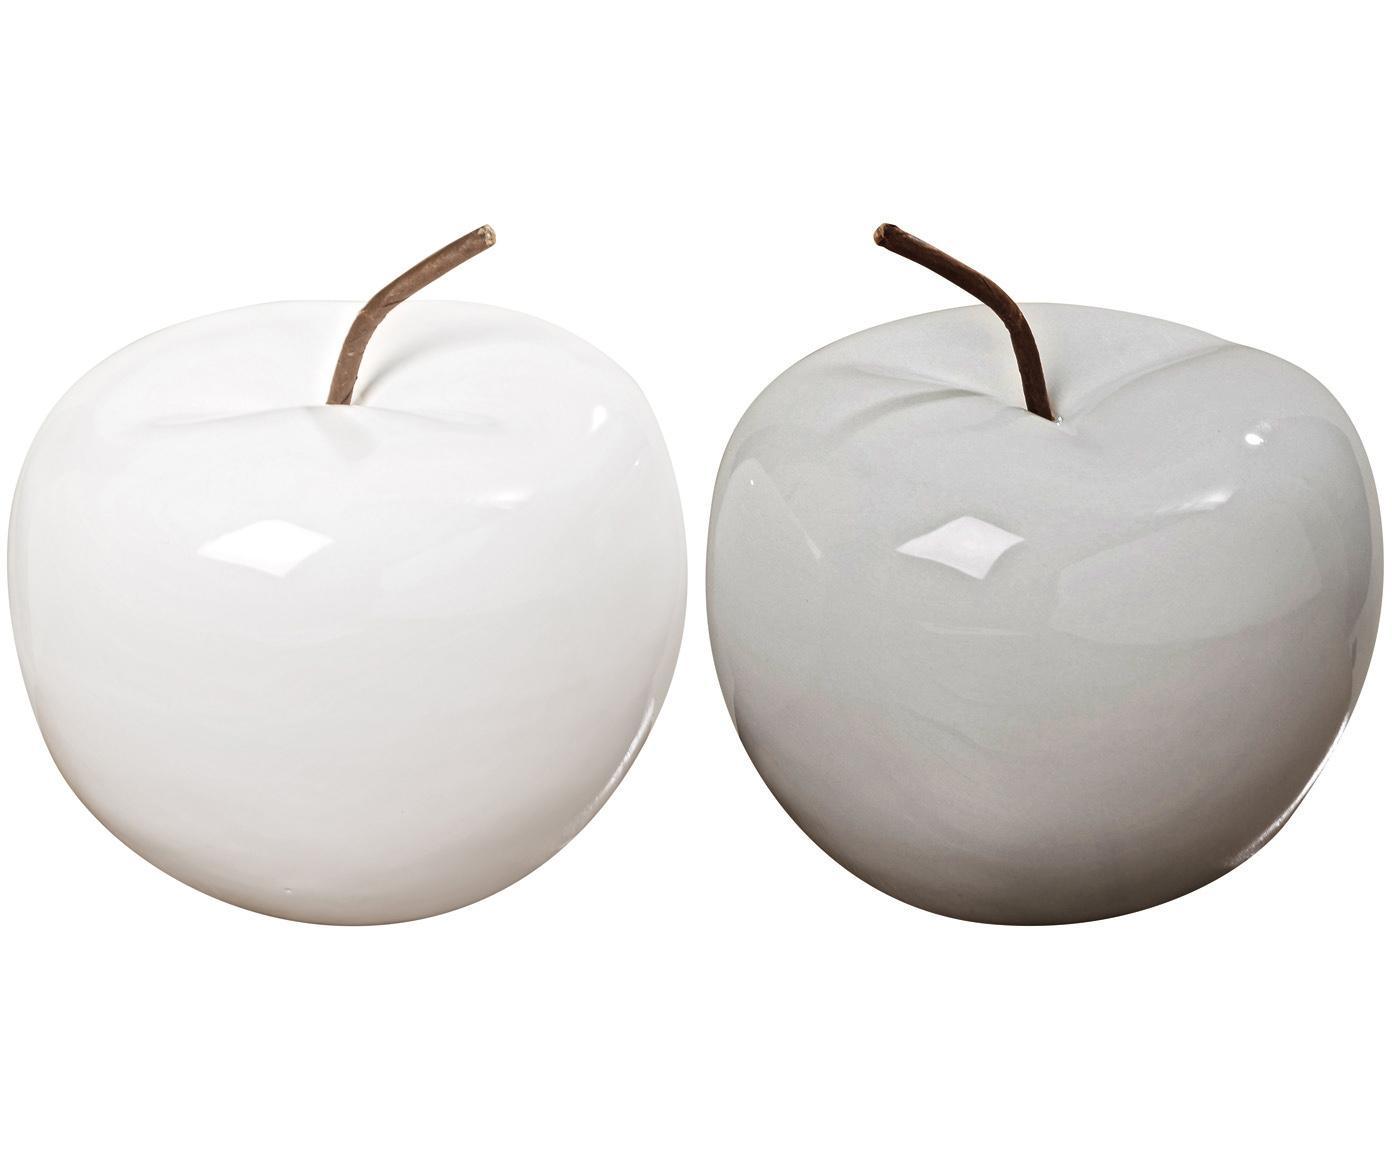 Decoratieve appels Alvaro, 2 stuks, Keramiek, Wit, bruin, Ø 13 x H 12 cm